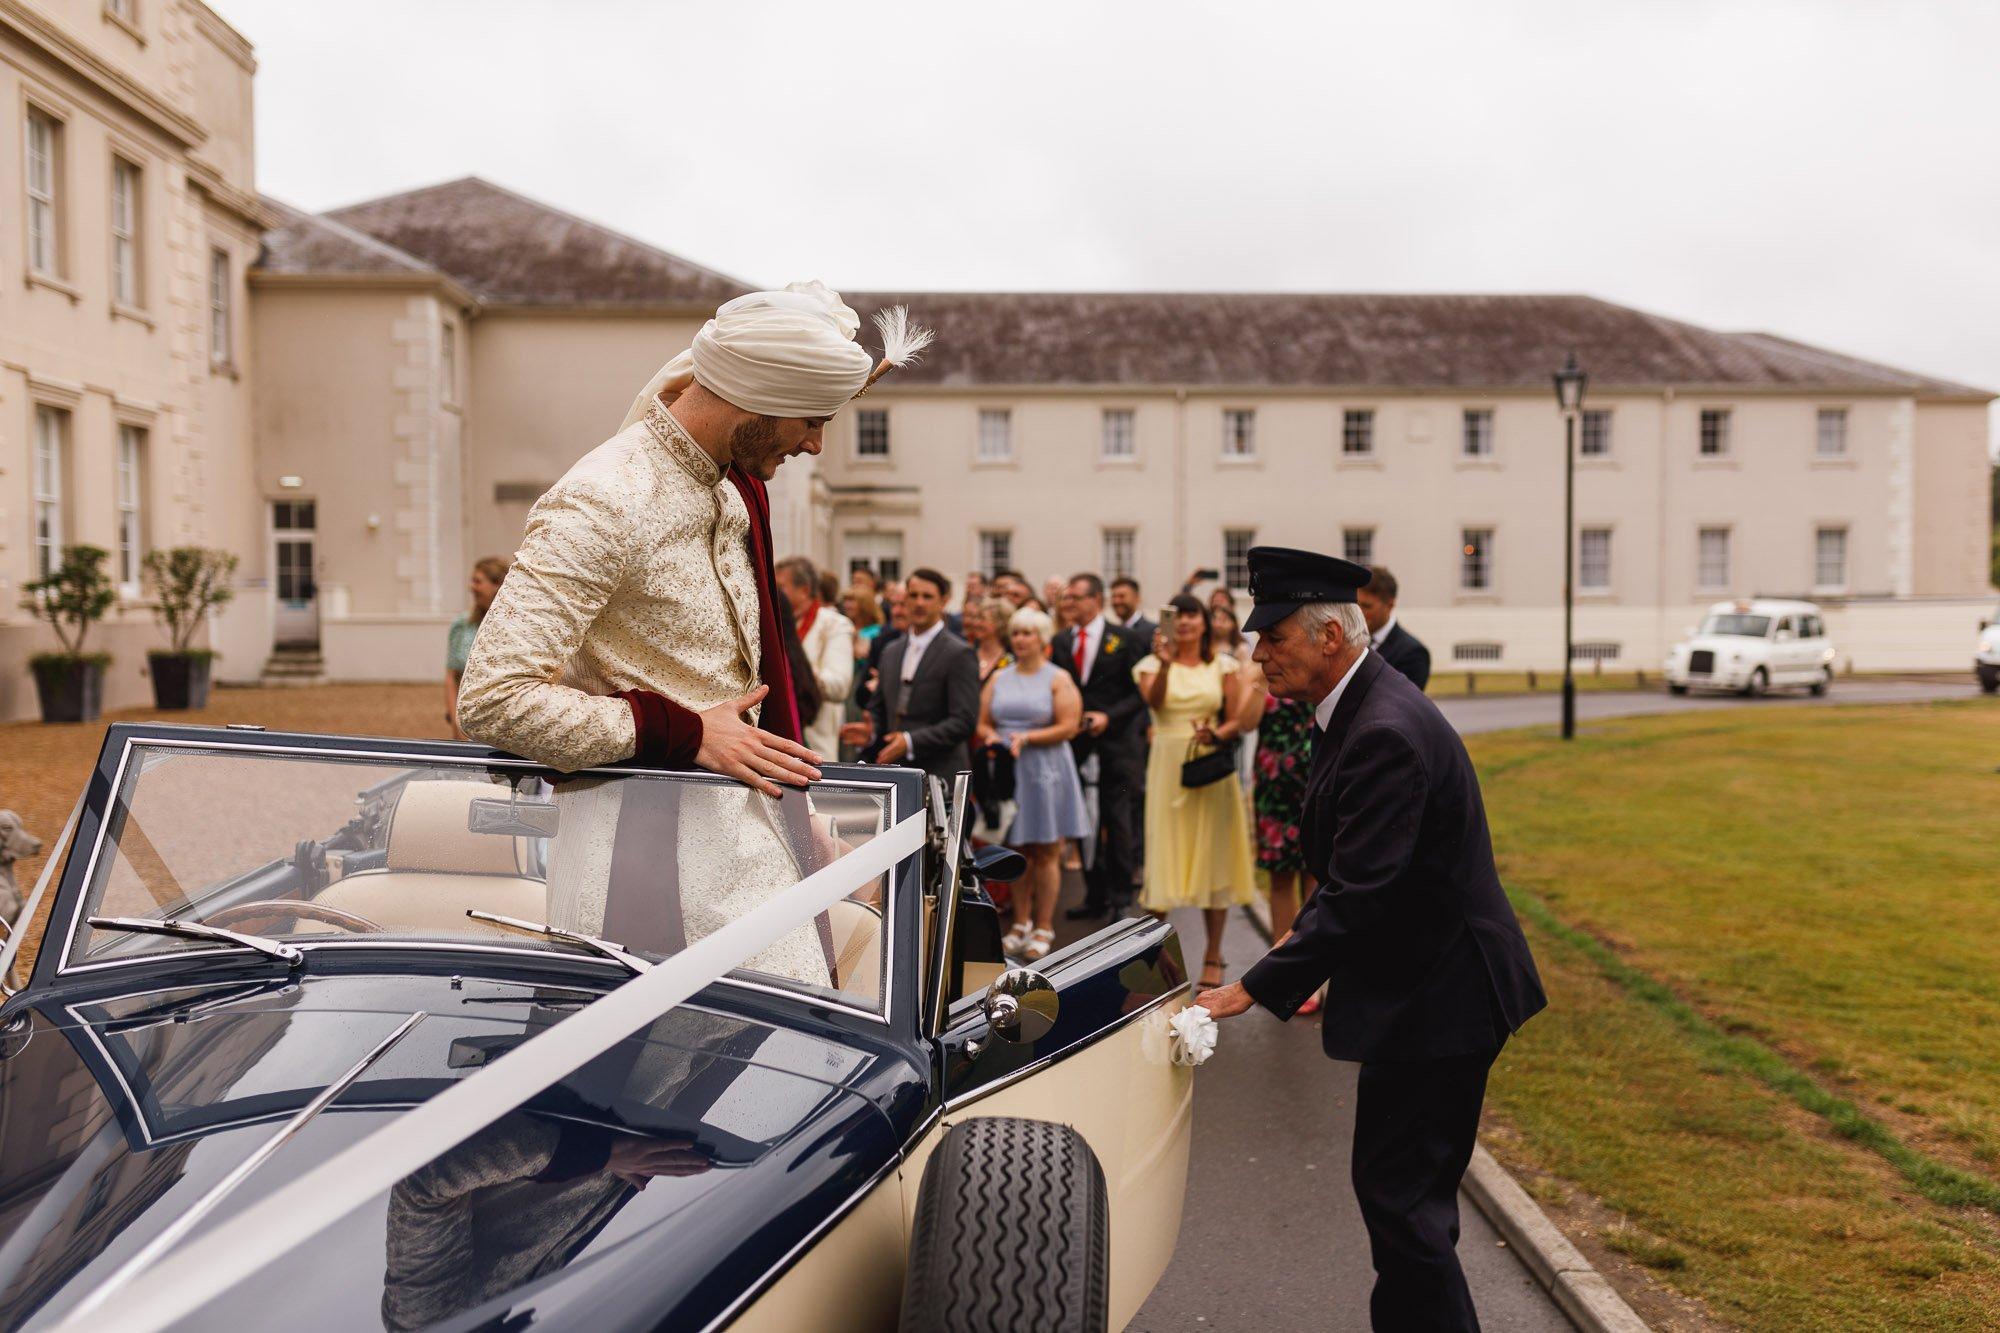 De Vere Wokefield Estate, Asian wedding photographer, grooms entrance, grooms arrival, vintage car